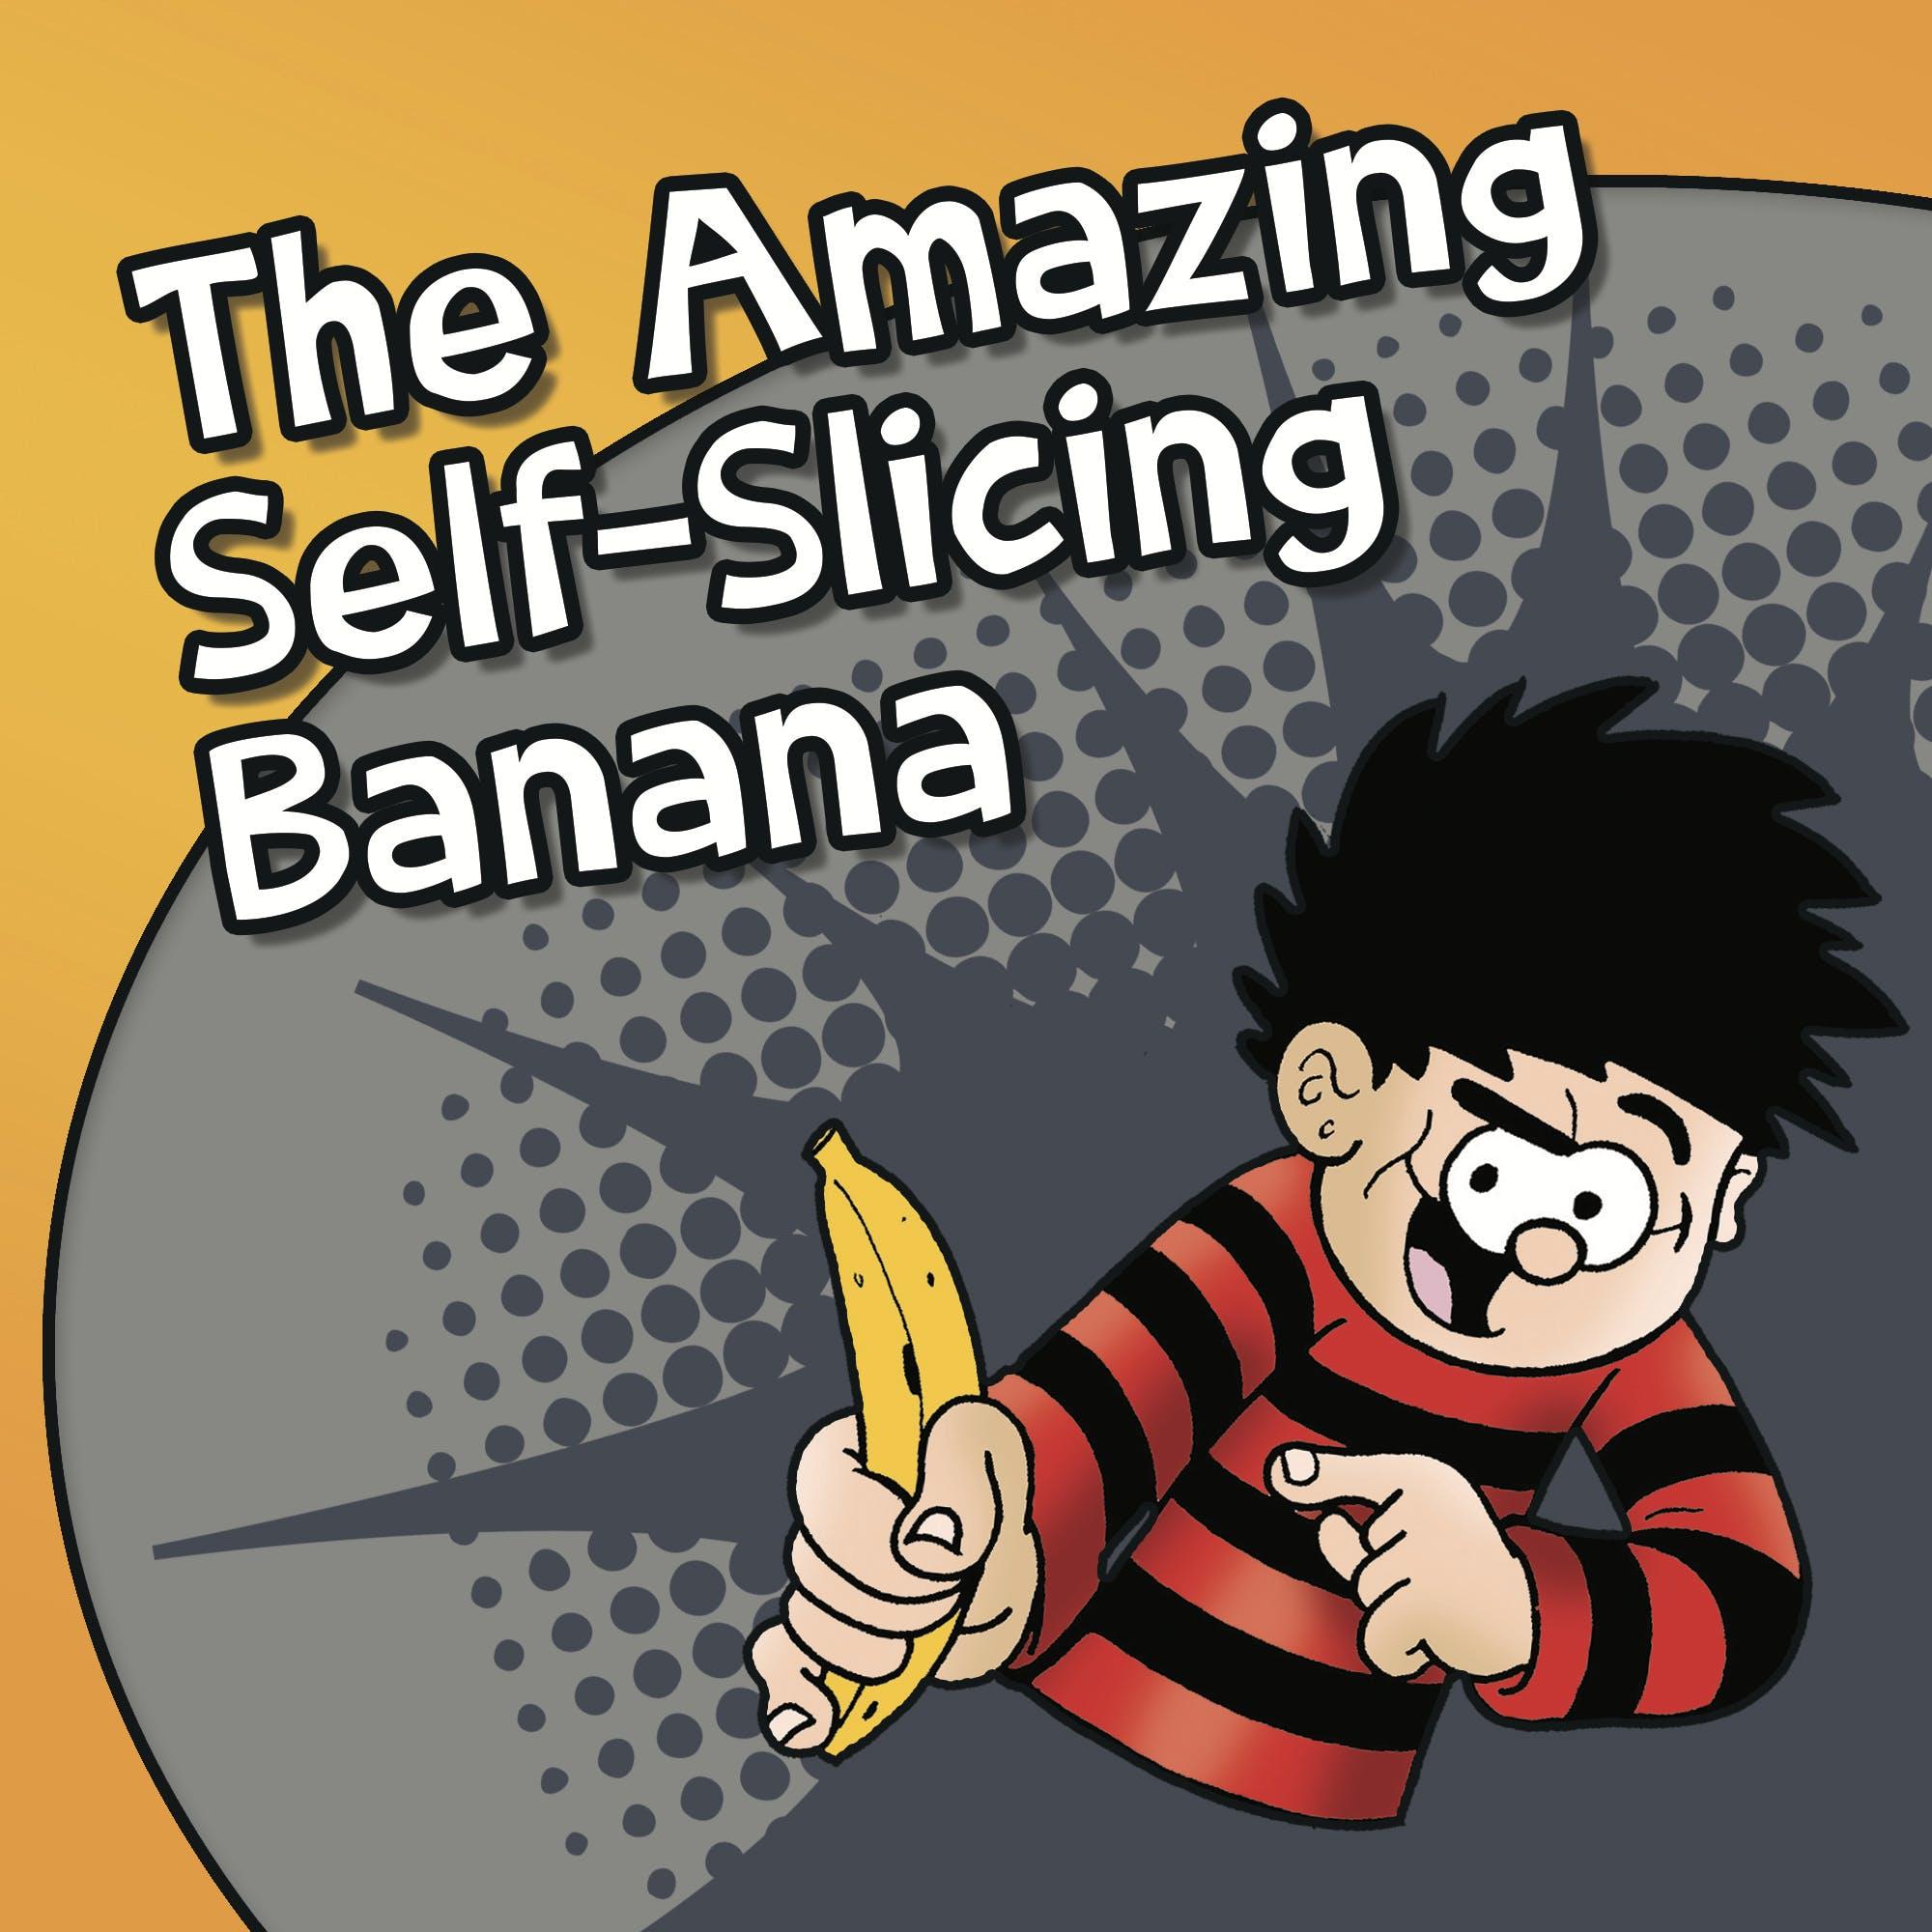 Banana prank title